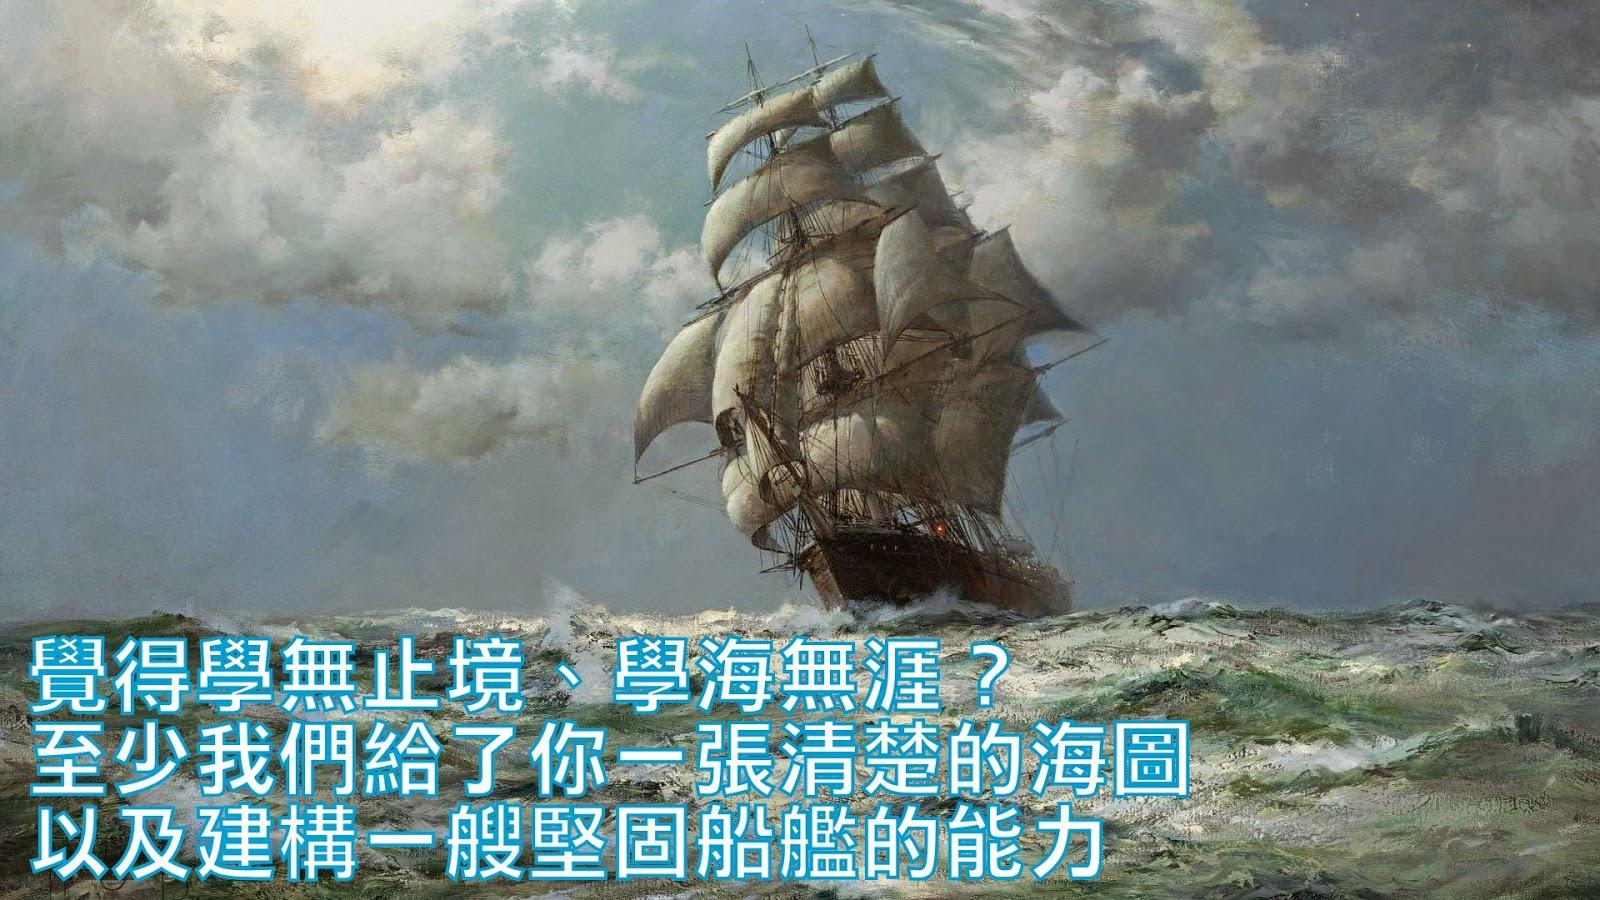 http://3.bp.blogspot.com/-sGf5L3mCWig/U6LrXUNn8DI/AAAAAAABK08/wvgdULMbWQc/s1600/sail-schooner-ship-ocean-painting-image-resolution-x-479794.jpg